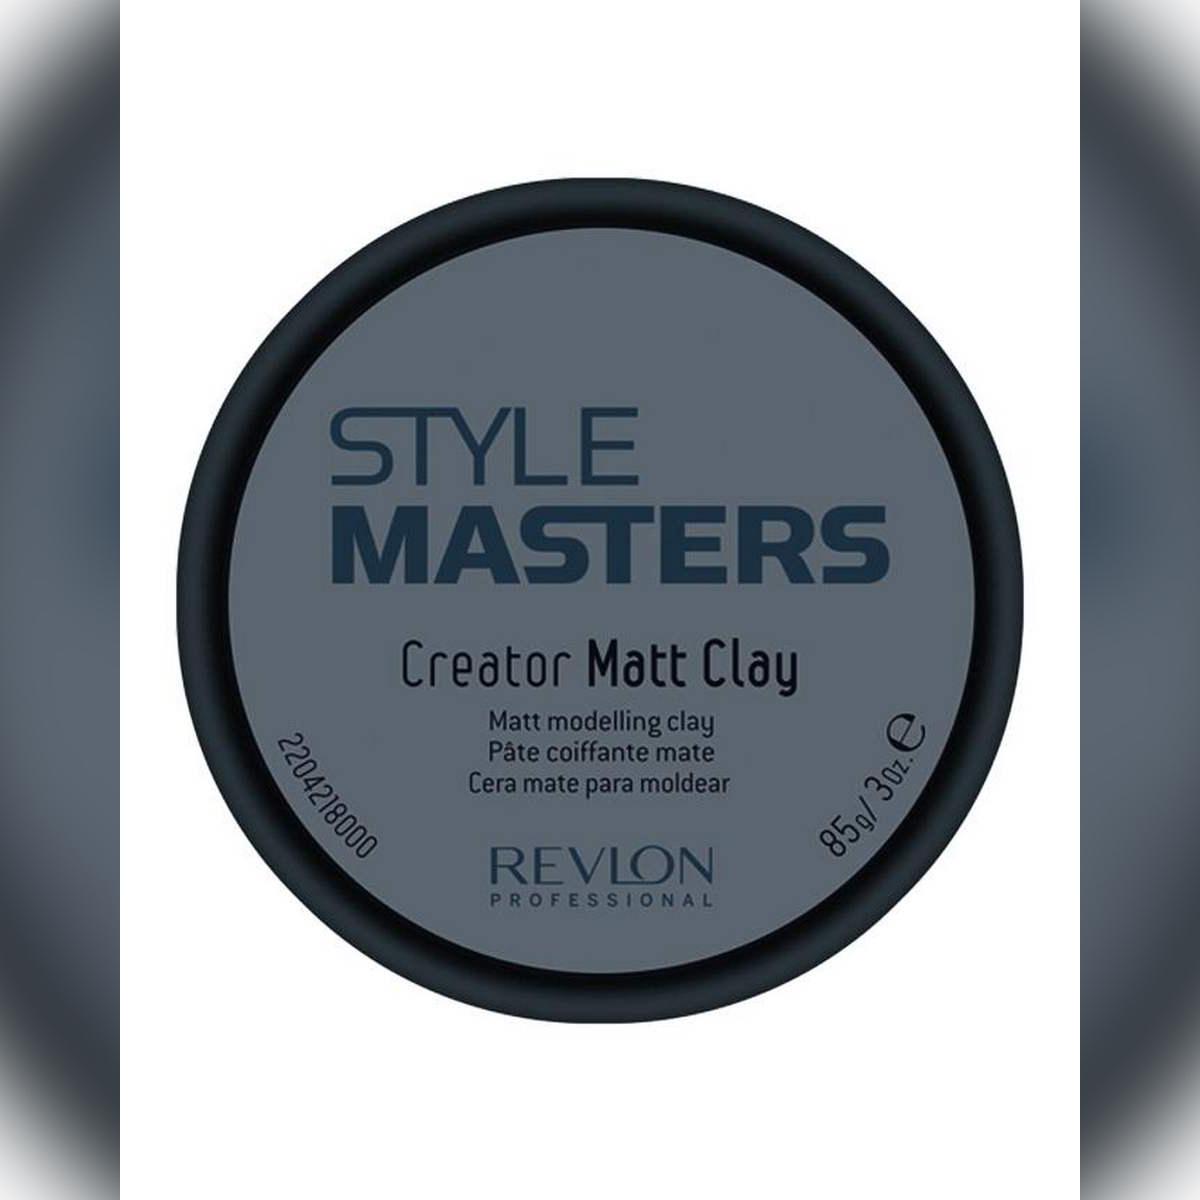 STYLE MASTERS™ Creator Matt Clay Hair Wax - 85gm